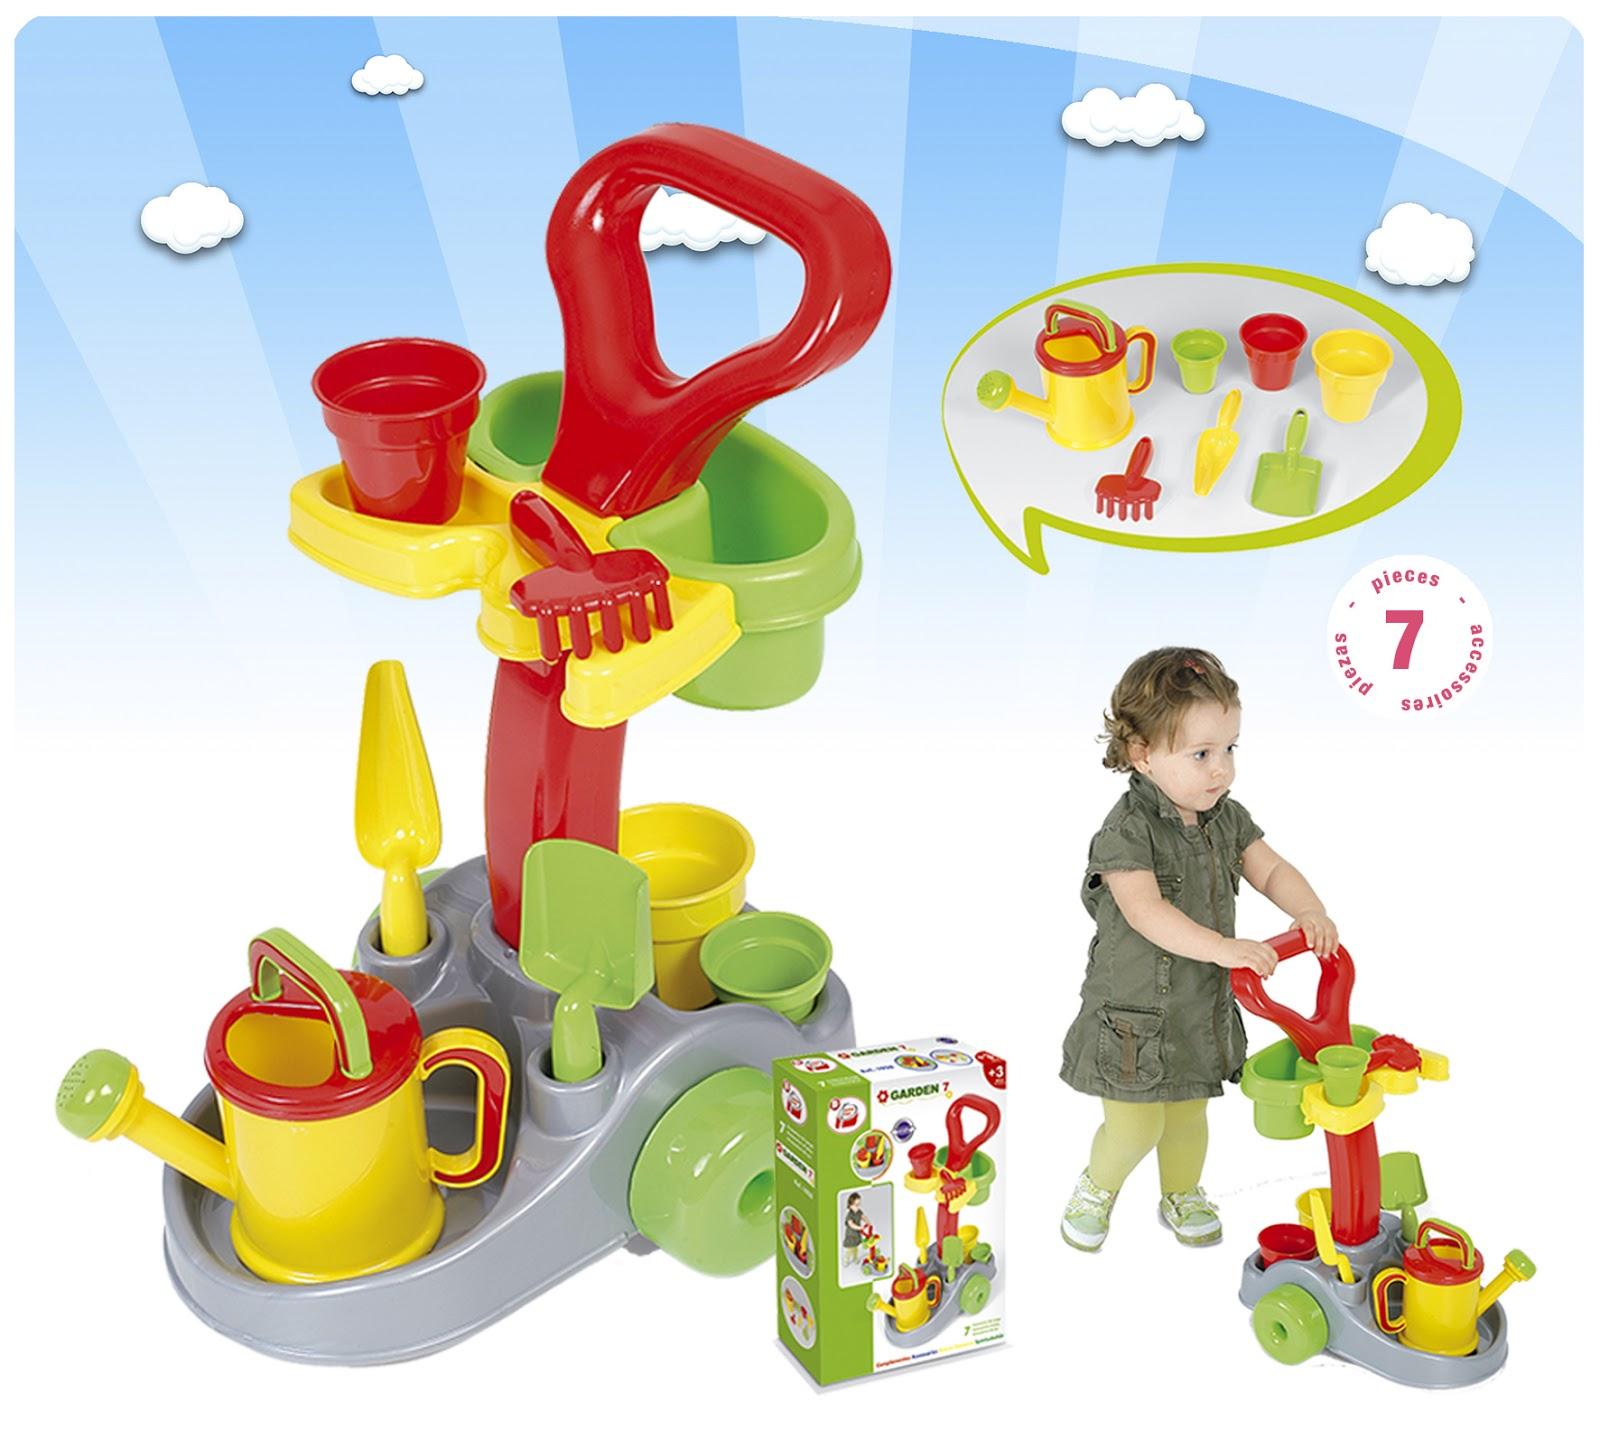 Juguetes Para Ninos De 3 A 6 Anos La Imaginacion Al Poder Palau Toys